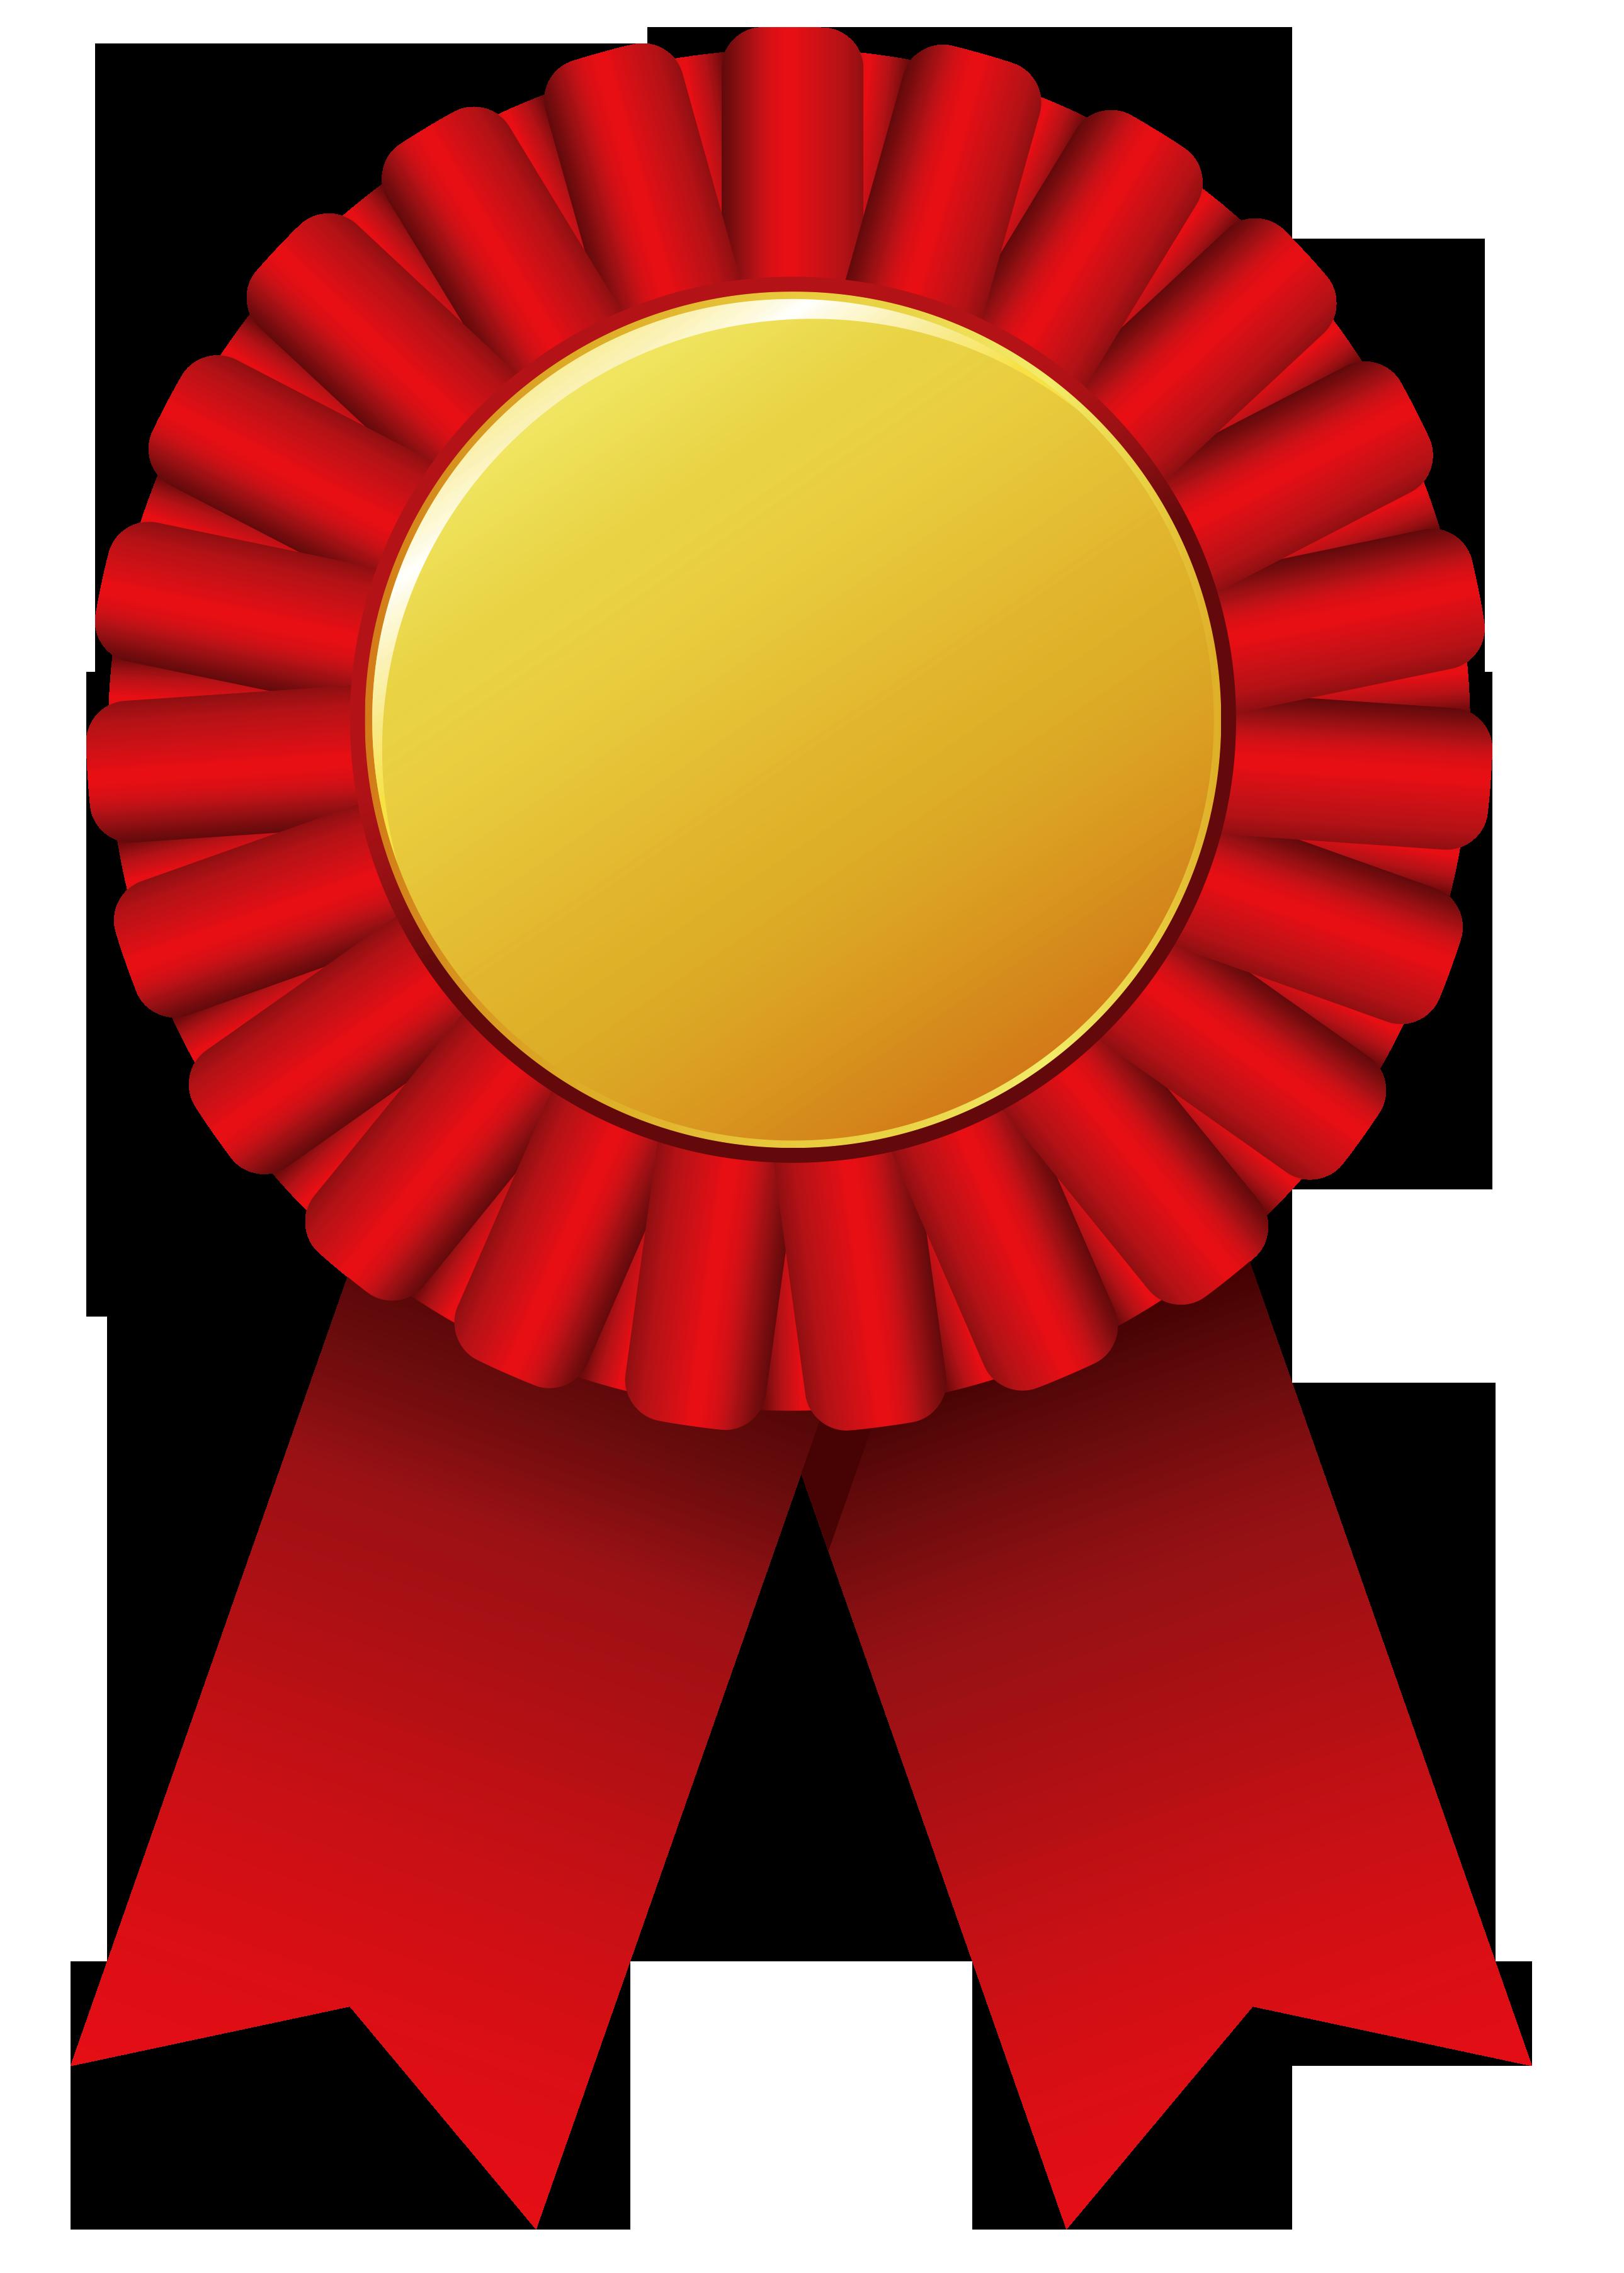 Red Rosette Ribbon PNG Clipar Image.